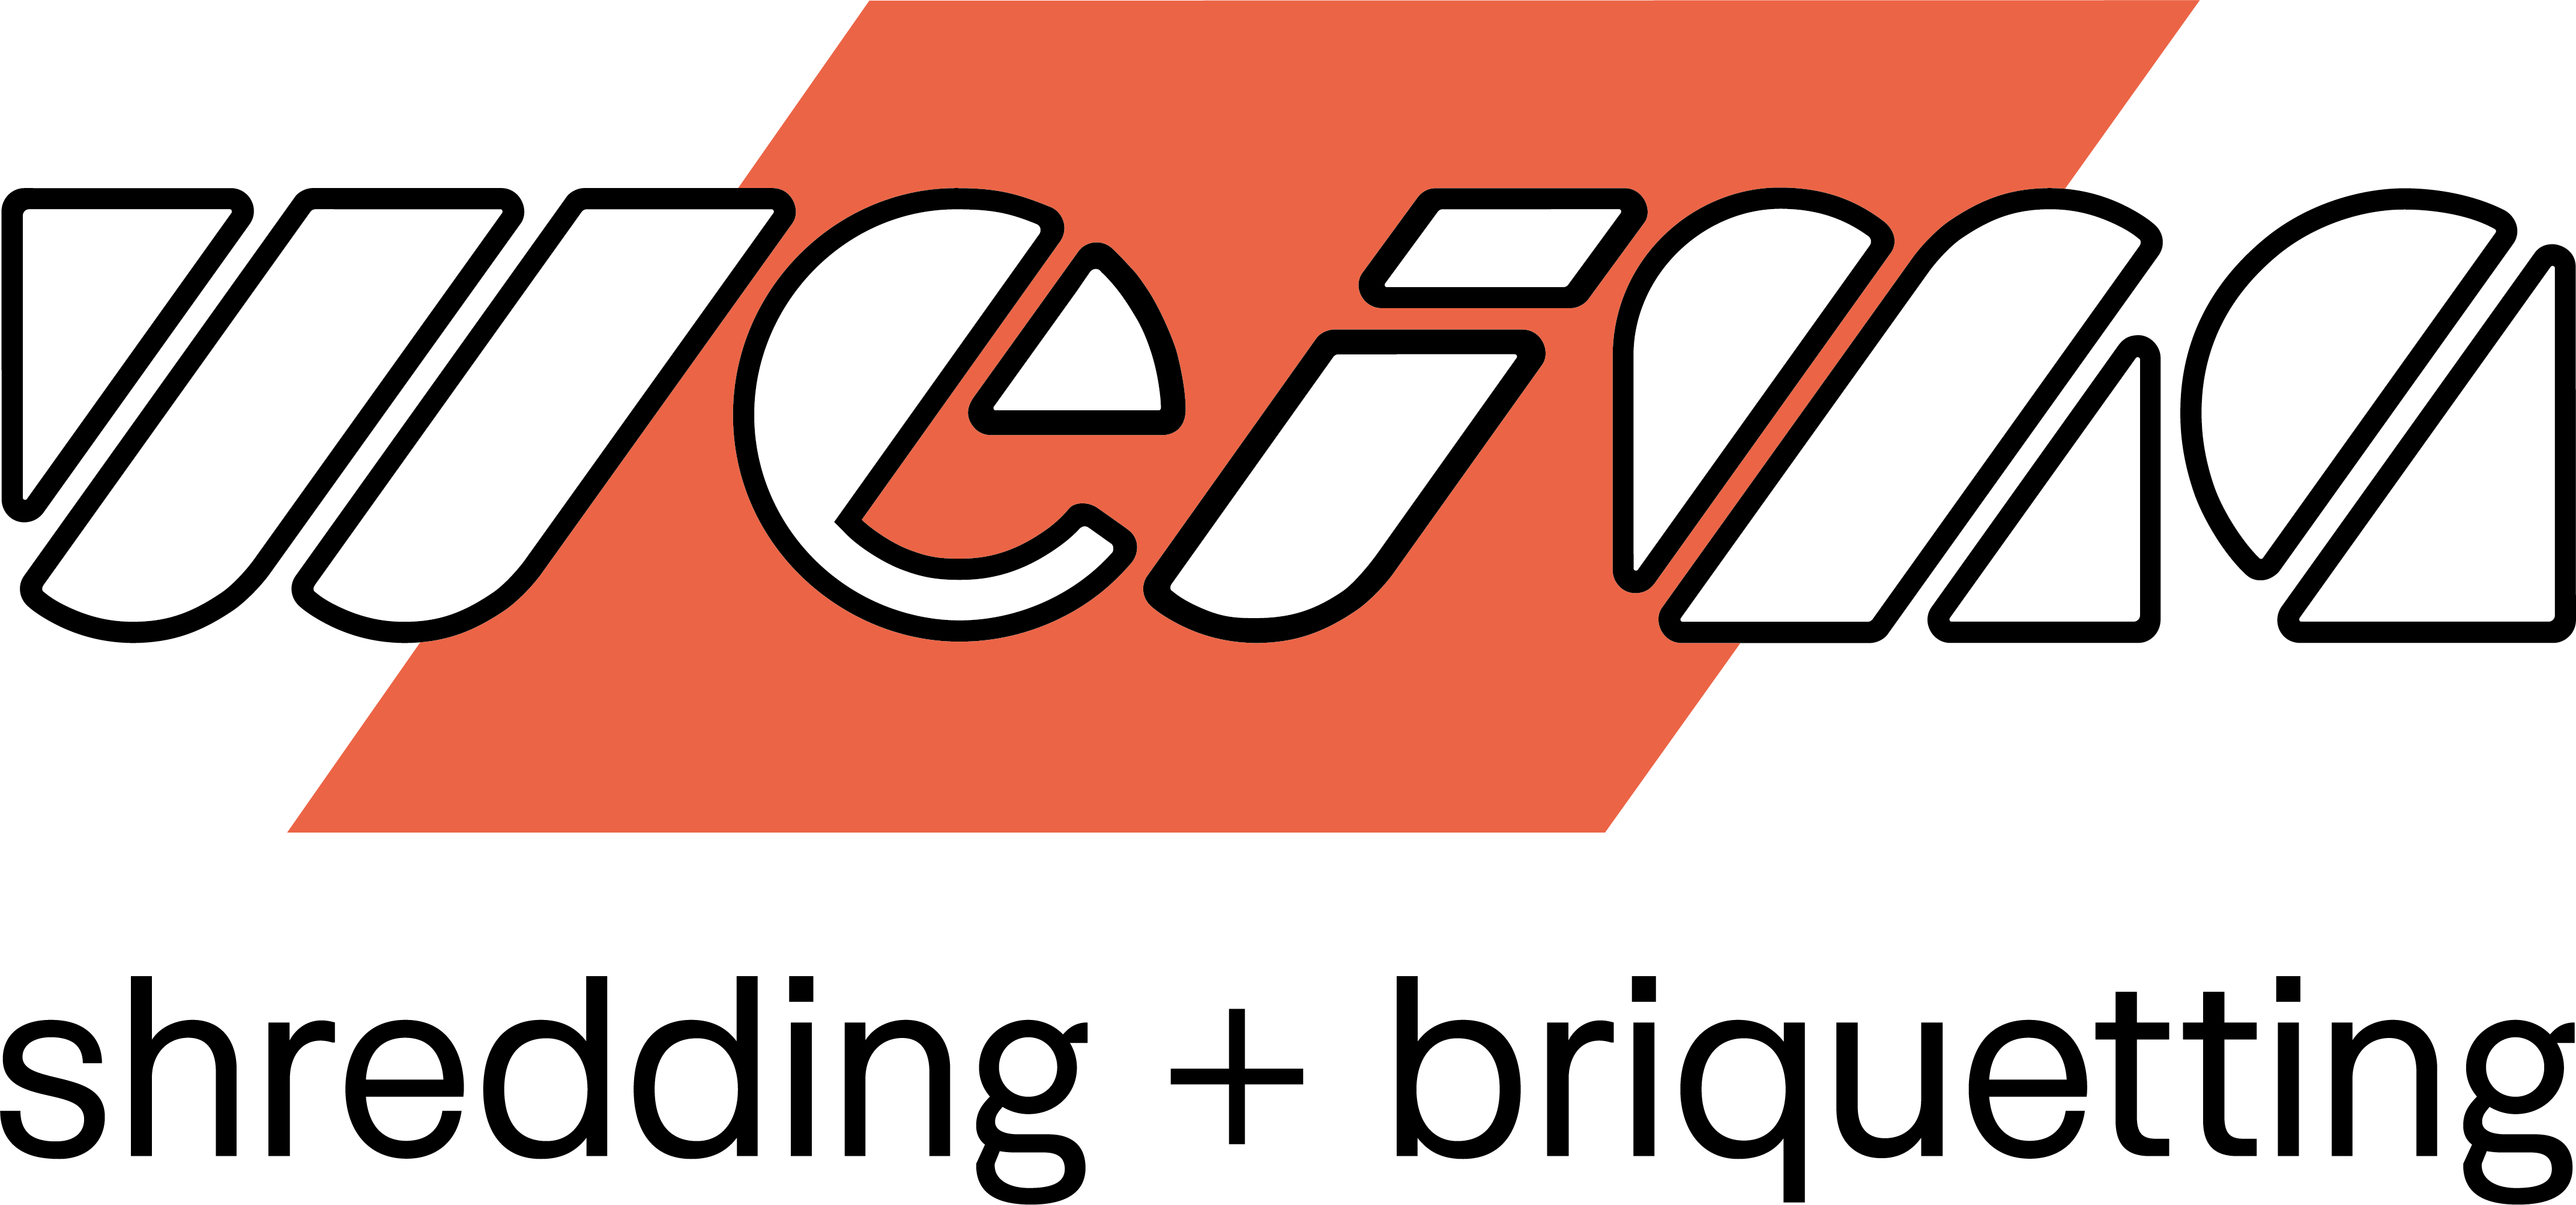 WEIMA Maschinenbau GmbH